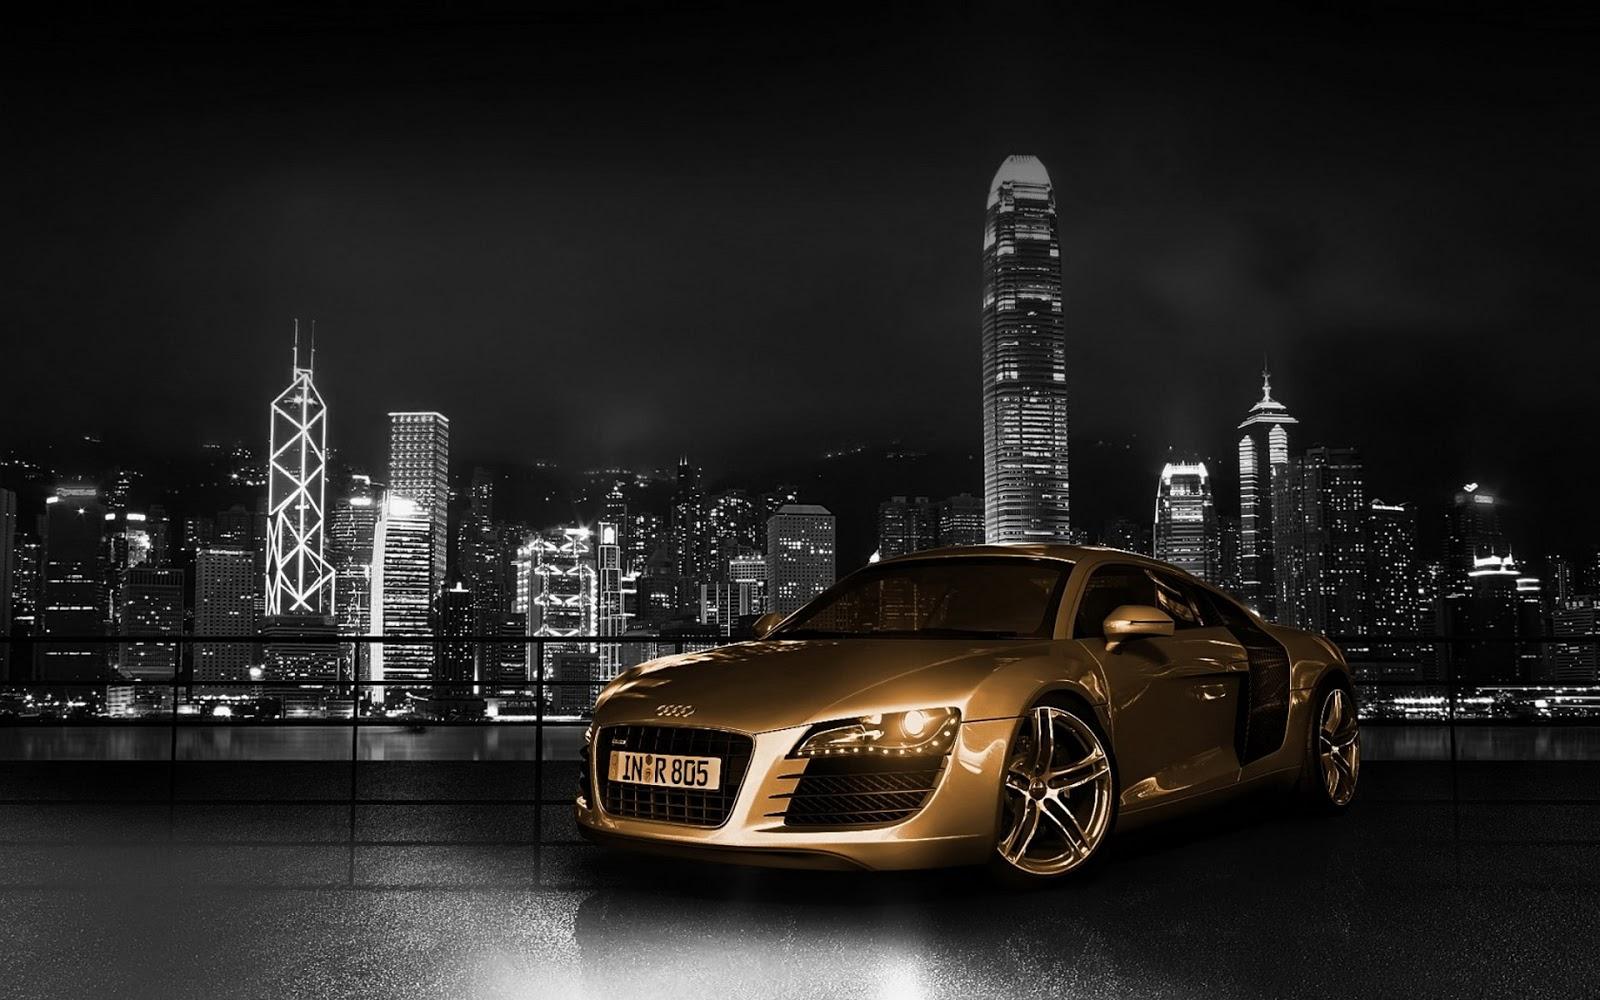 http://3.bp.blogspot.com/-TQIPQXSxChQ/UNH3ncE6-tI/AAAAAAAABQA/_gGD19Kc7RY/s1600/hd-car-images-4.jpg